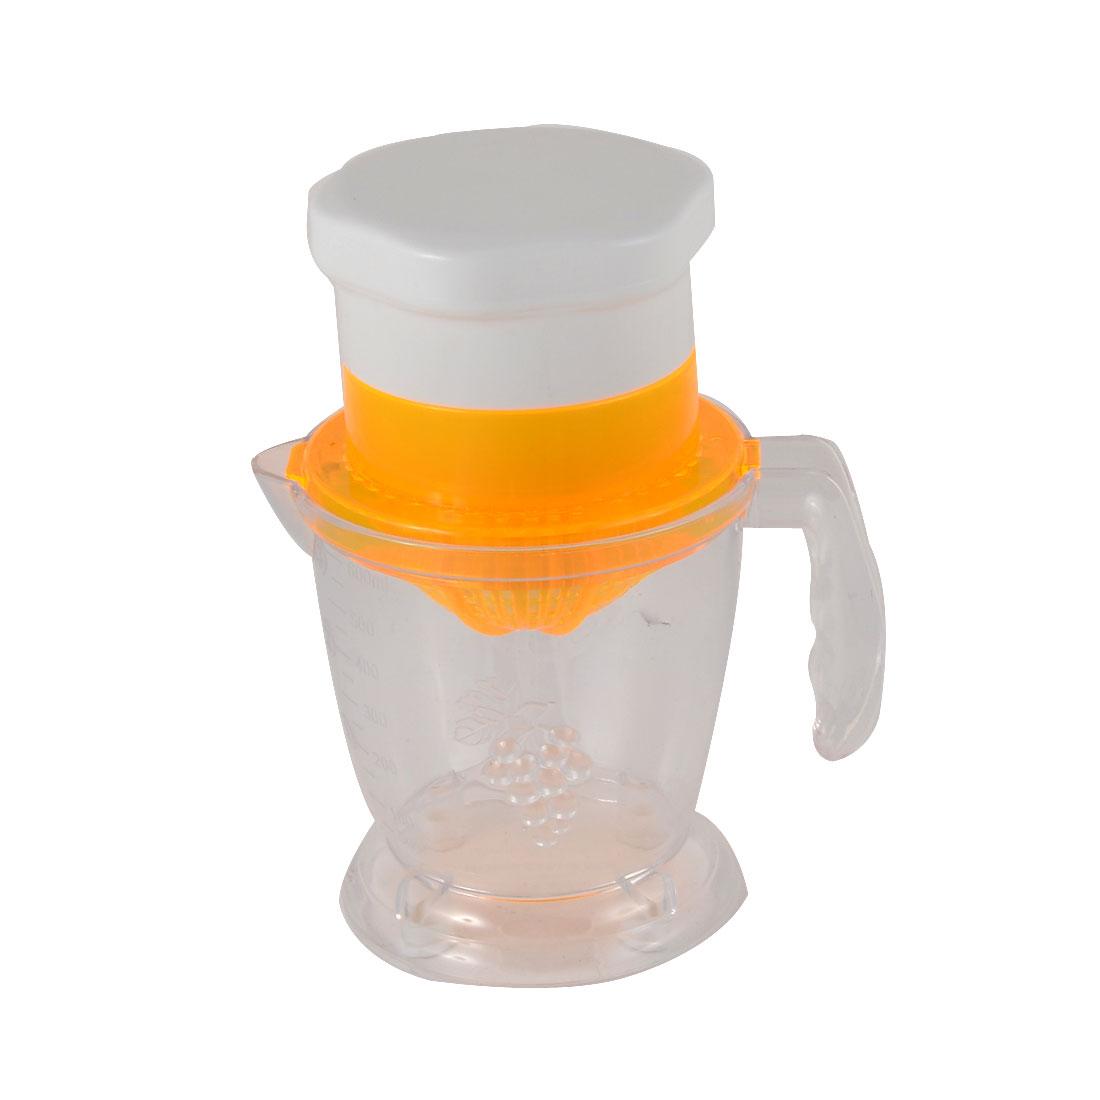 Home Kitchen Plastic Multifunction Citrus Orange Lemon Manual Juicer Juice Extractor Squeezer 600ml